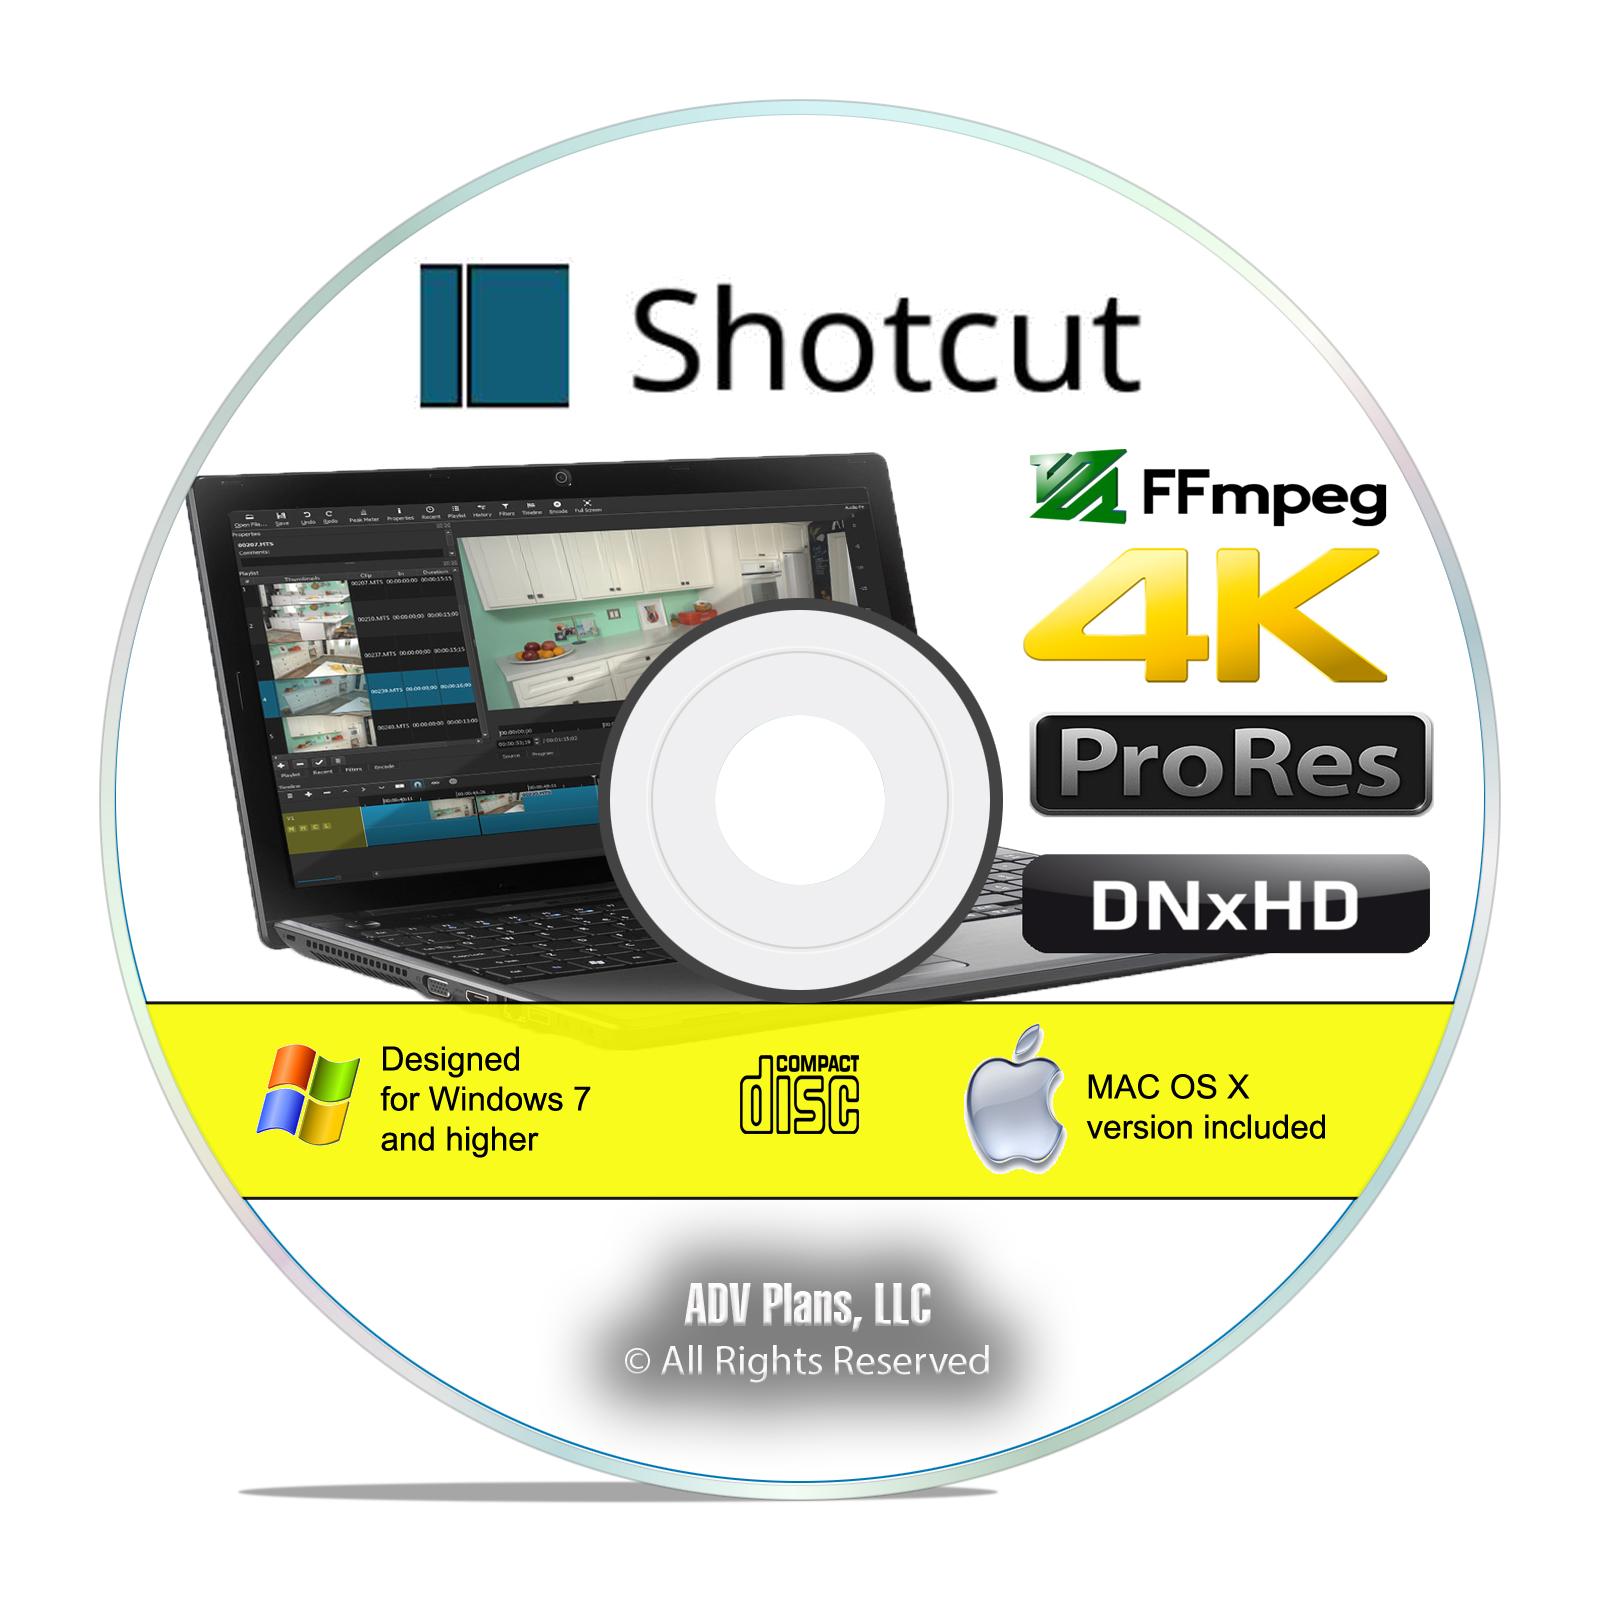 Details about Shotcut, Digital Darkroom Video Editing Software Suite CD,  Win/Mac/Linux I06